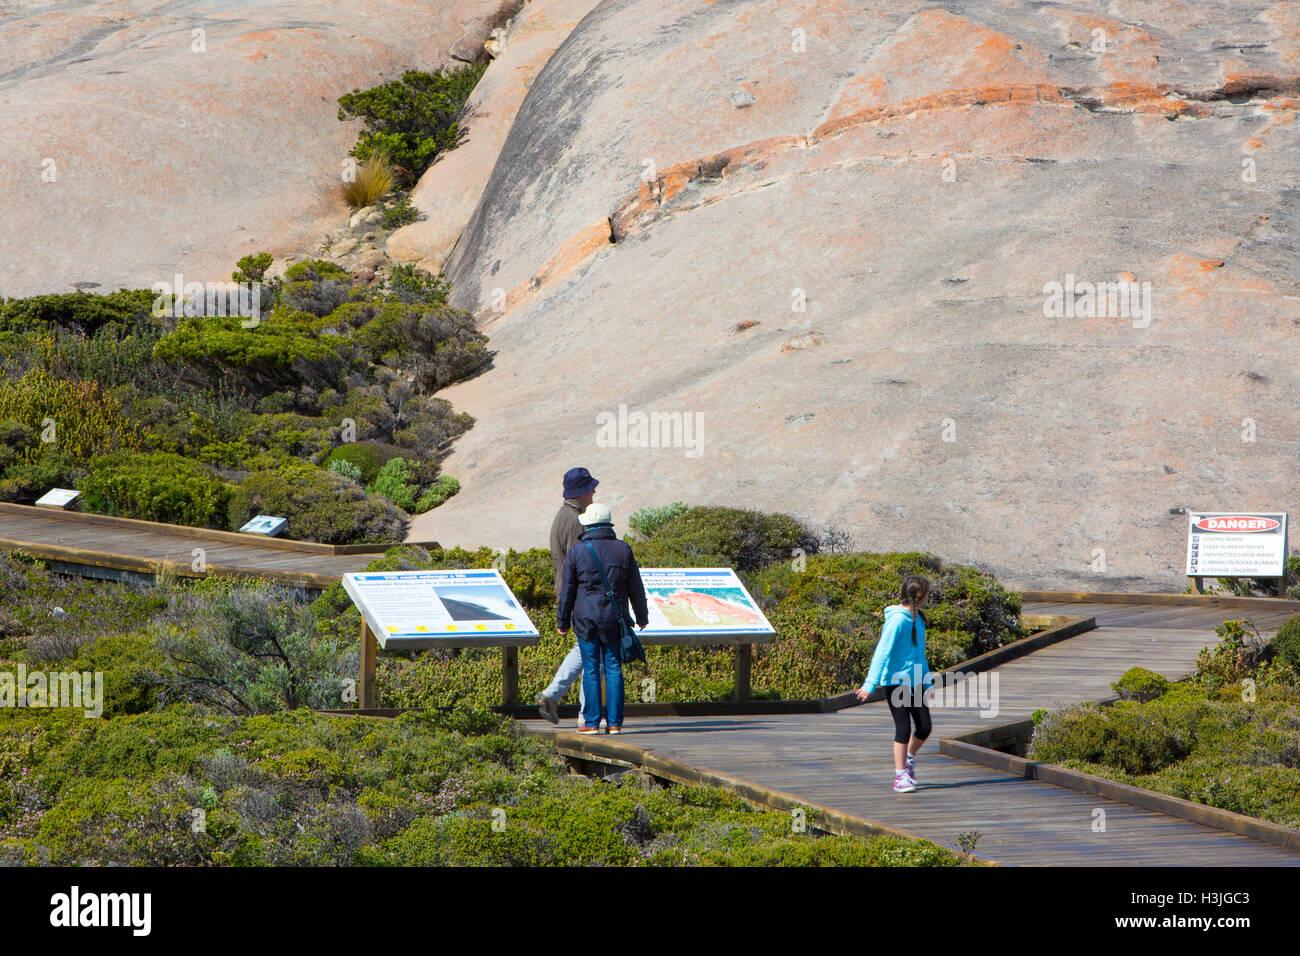 Remarable Rocks, formed through erosion, Flinders chase national park, Kangaroo island,South Australia - Stock Image